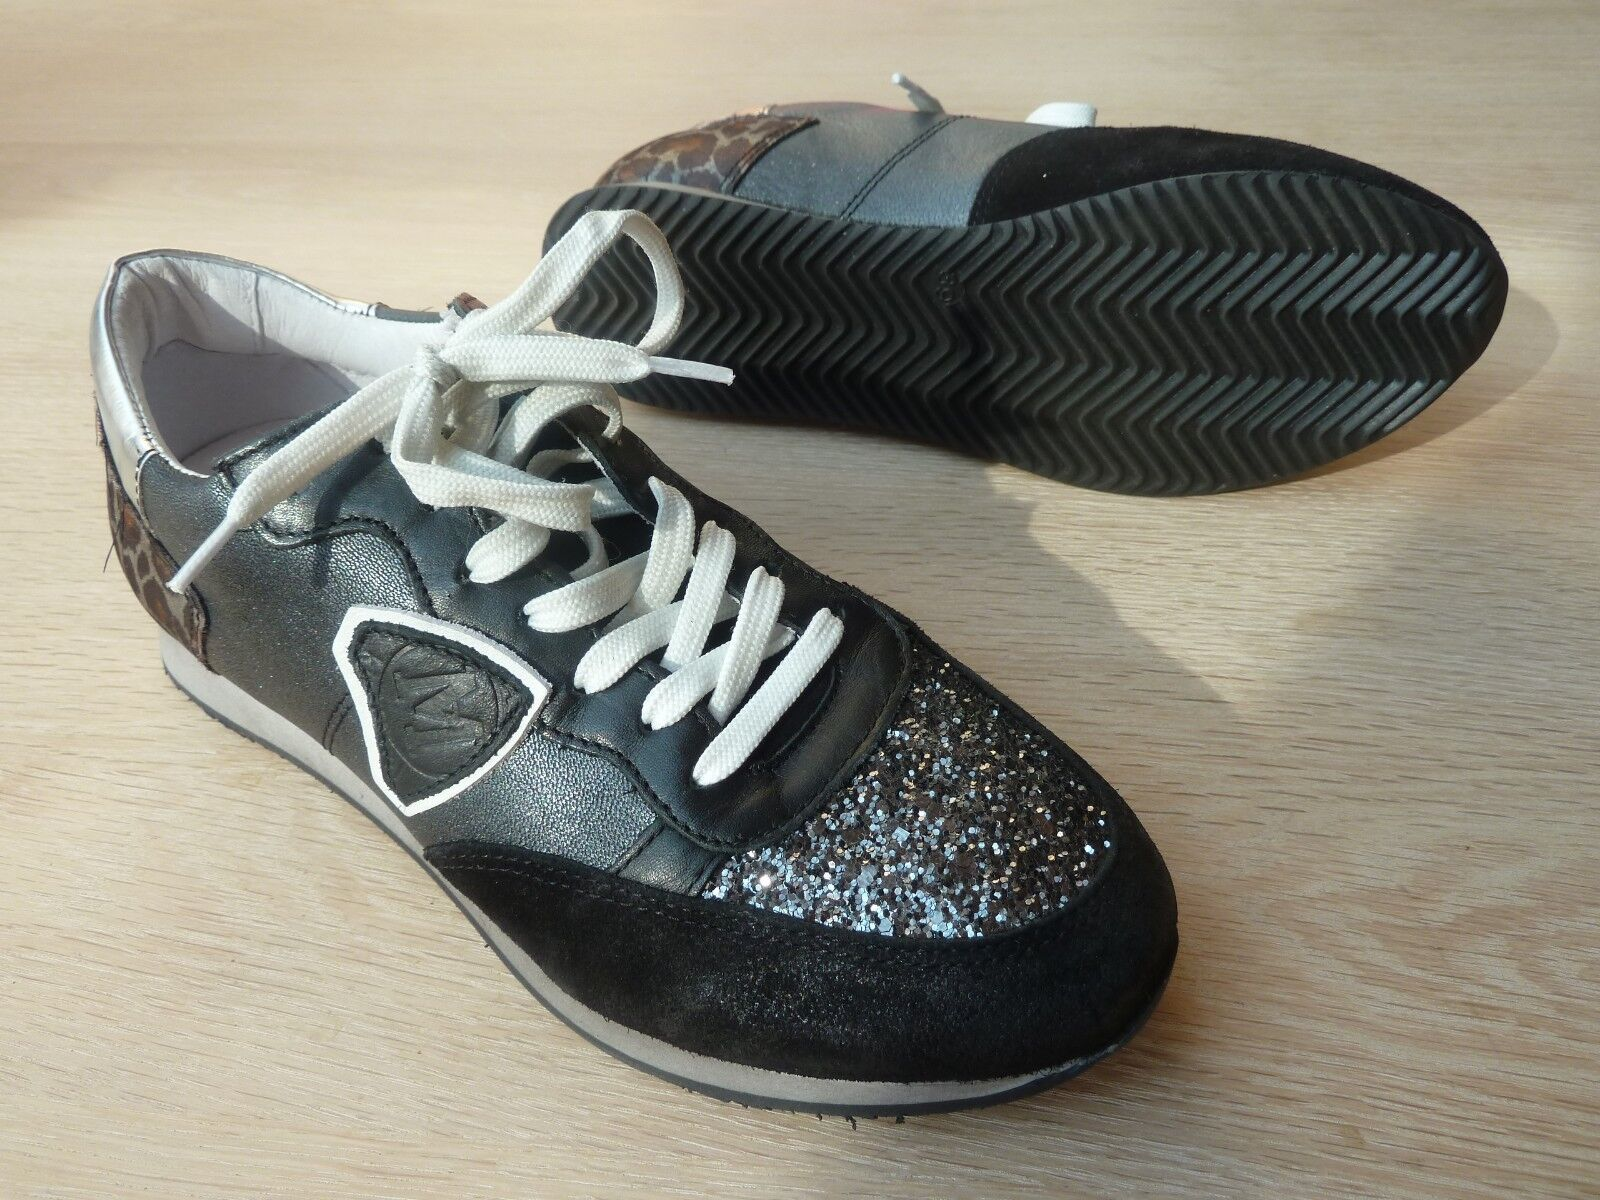 Halbschuhe/Sneakers von Maca Kitzbühl Gr. NP 38 NEU NP Gr. c375dc